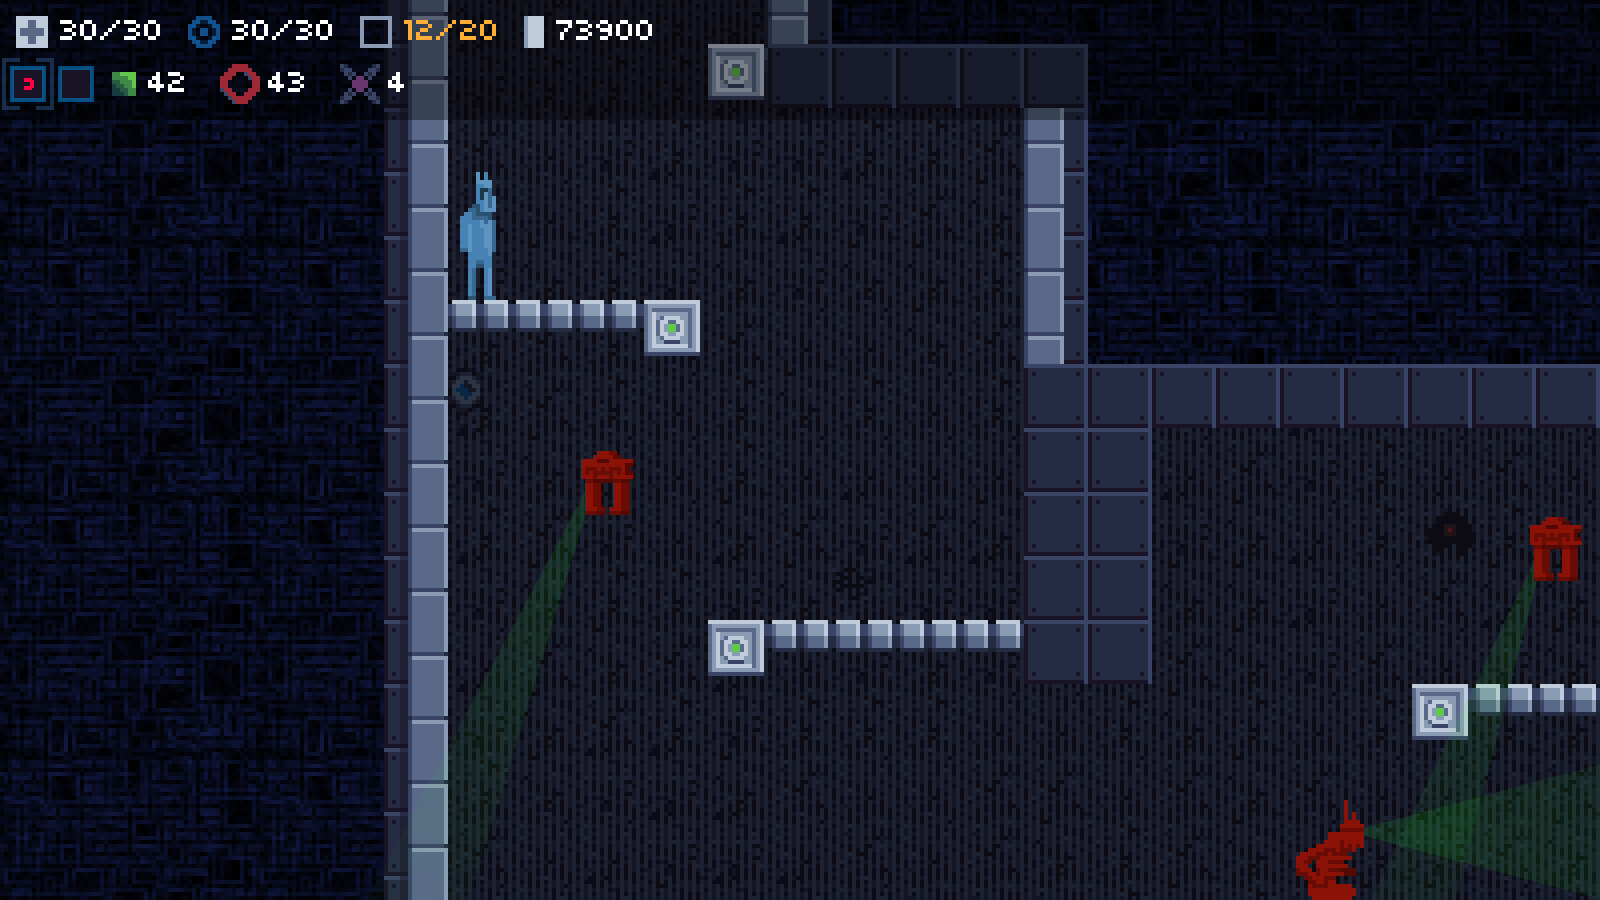 Neato screenshot of game